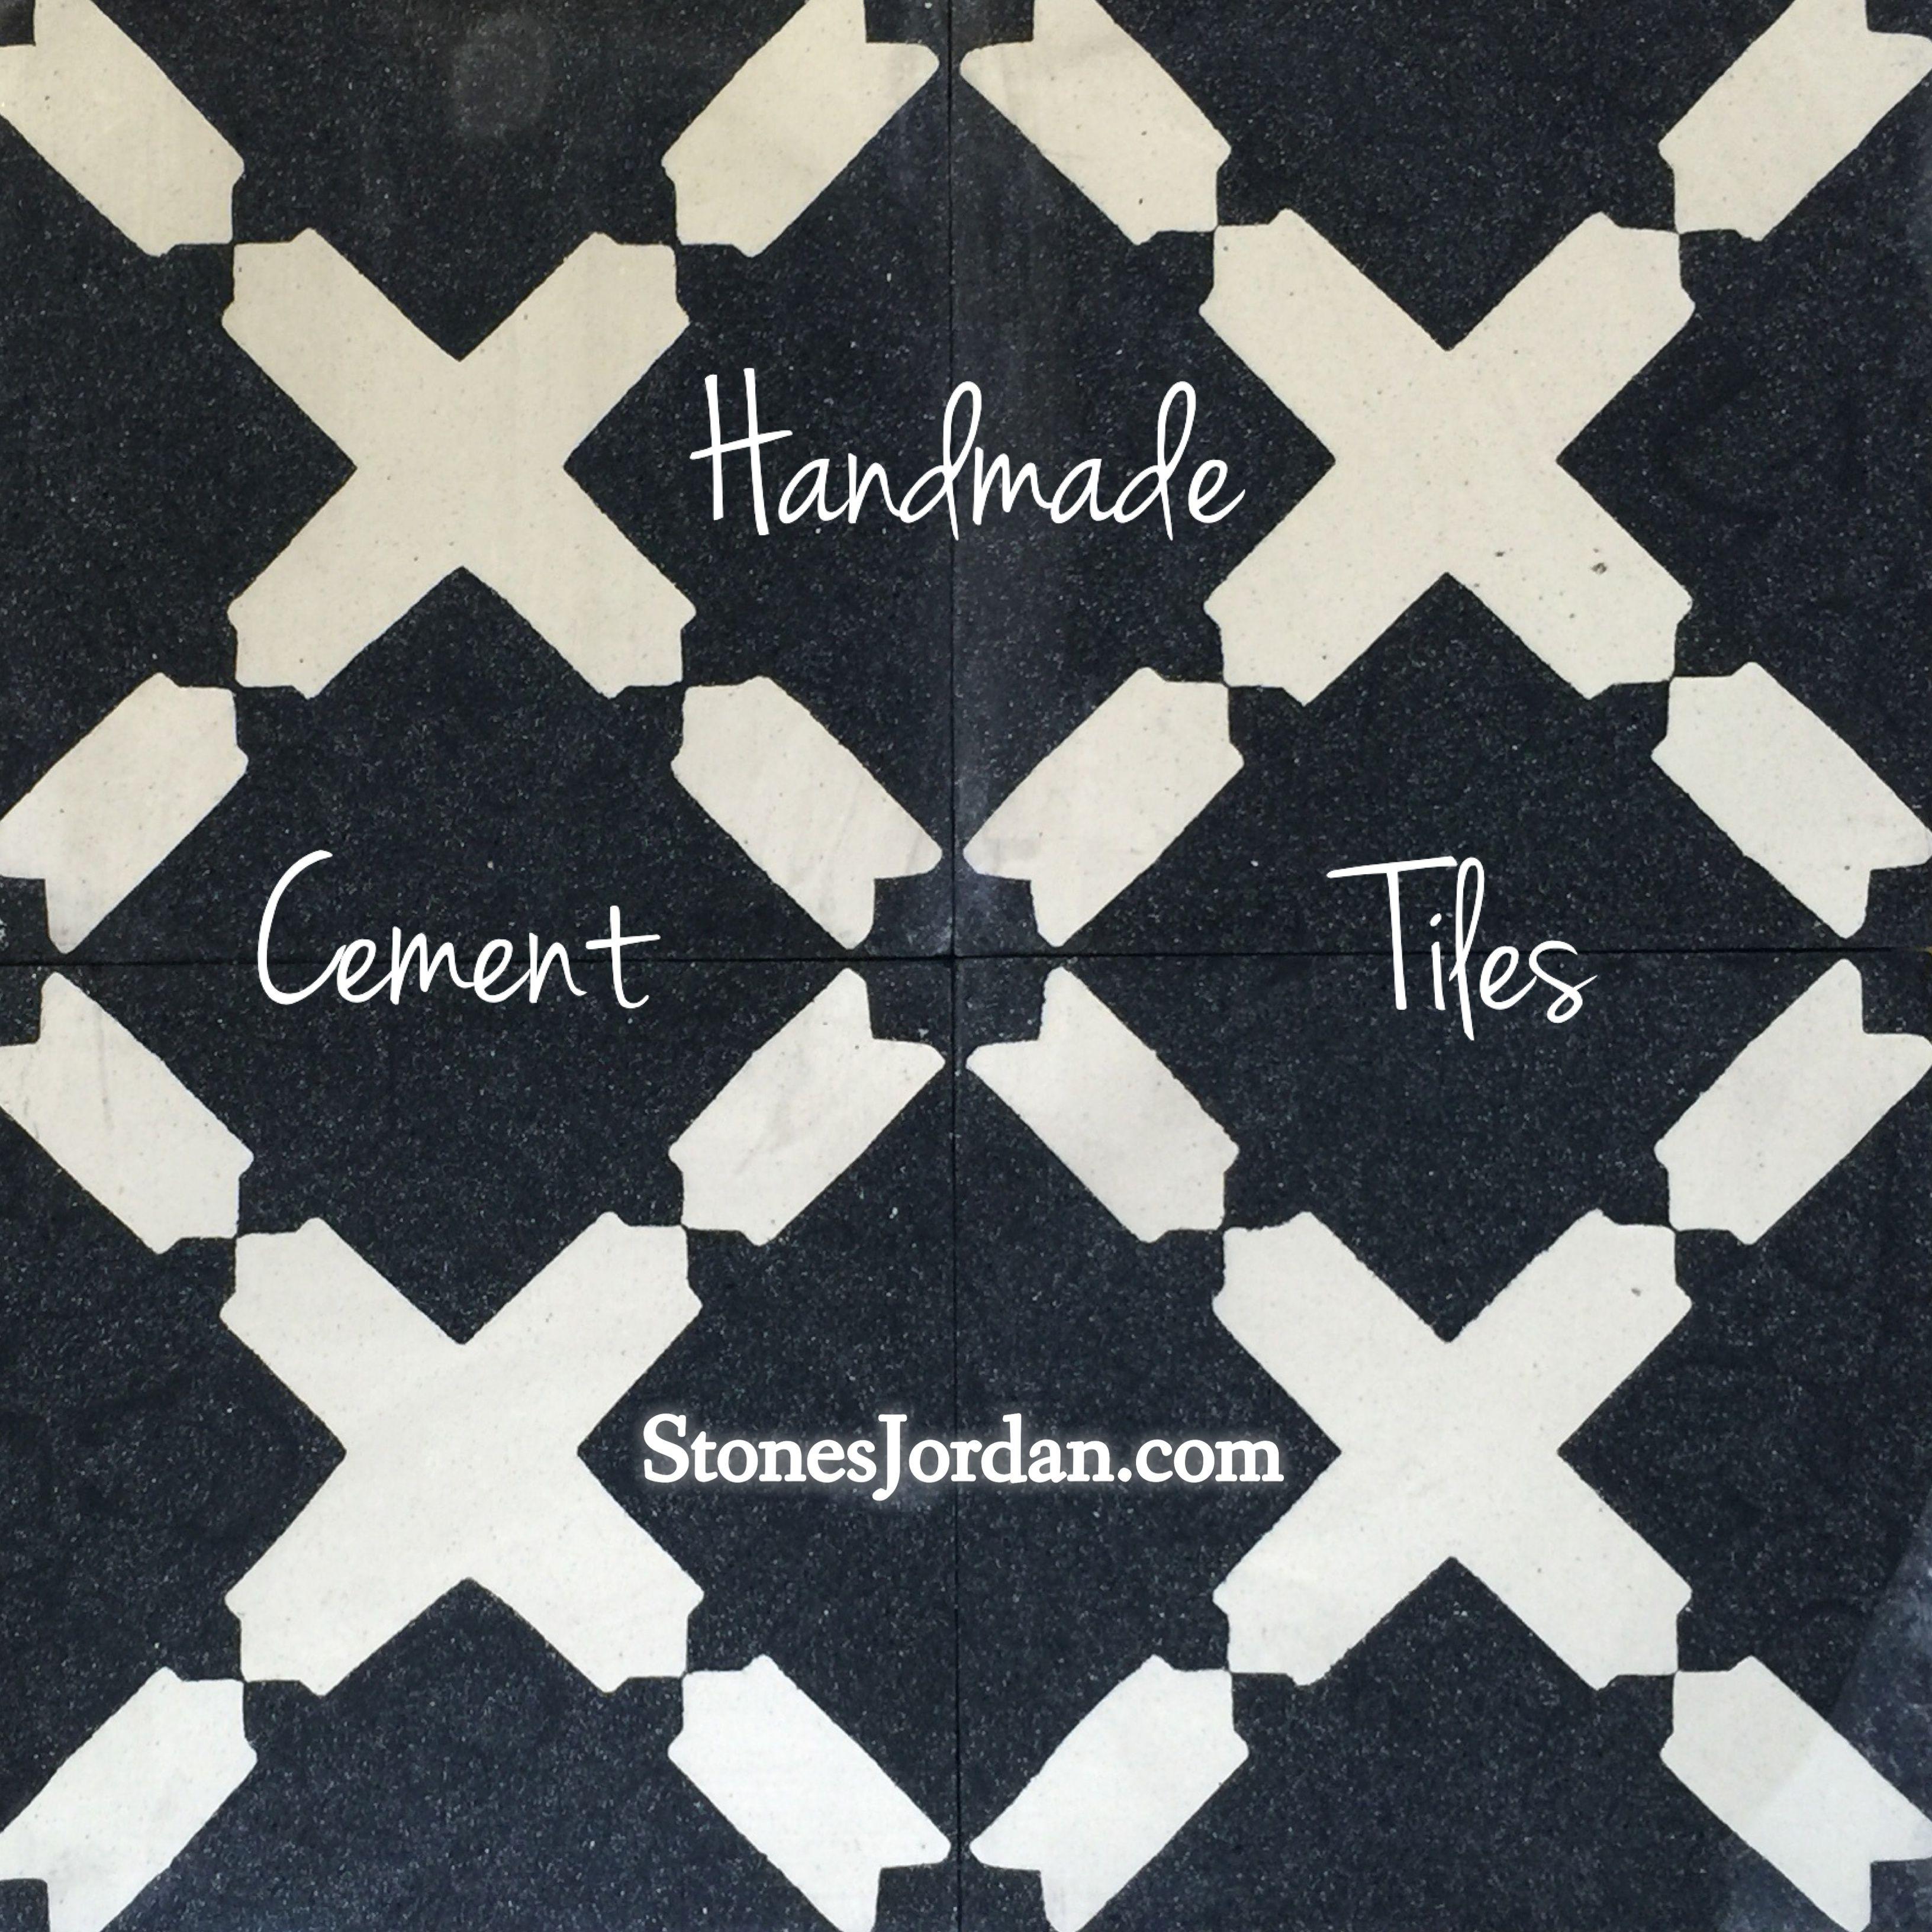 #Handmade #Cement_tiles #design #decoration #exteriordesign #decor #green_product #durable #customized_colors #Made_in_Jordan